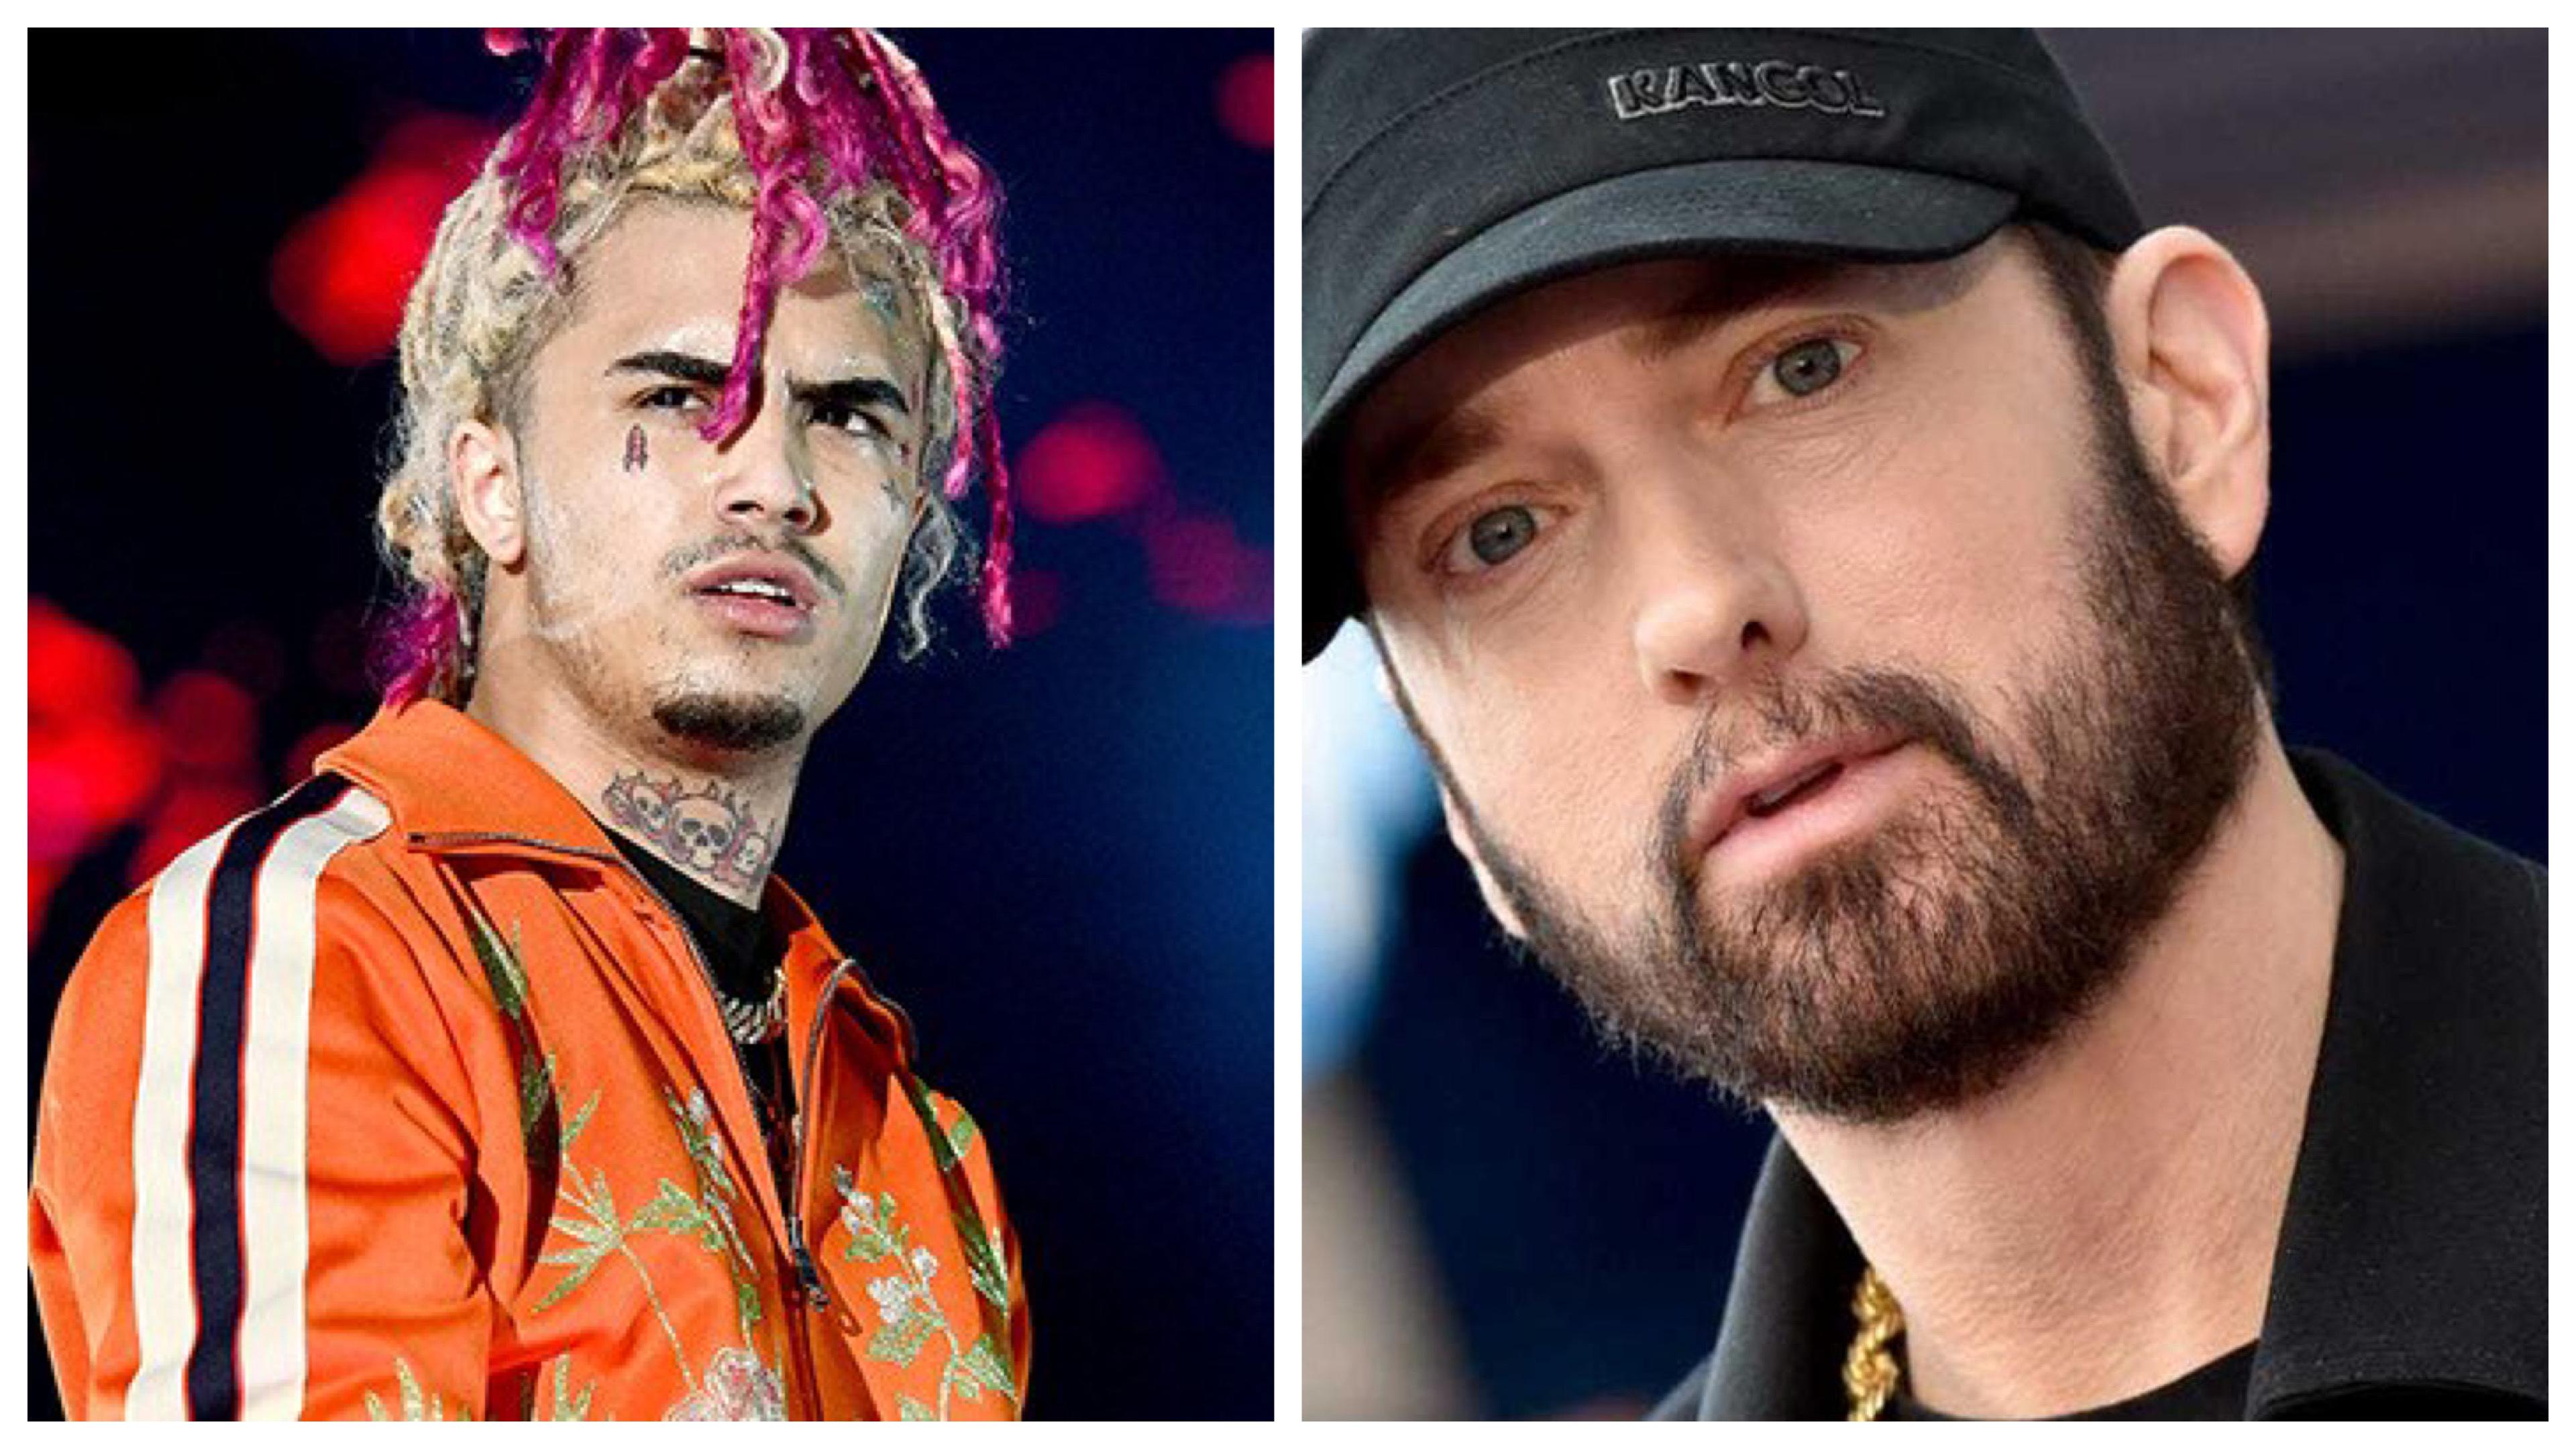 Lil Pump and Eminem